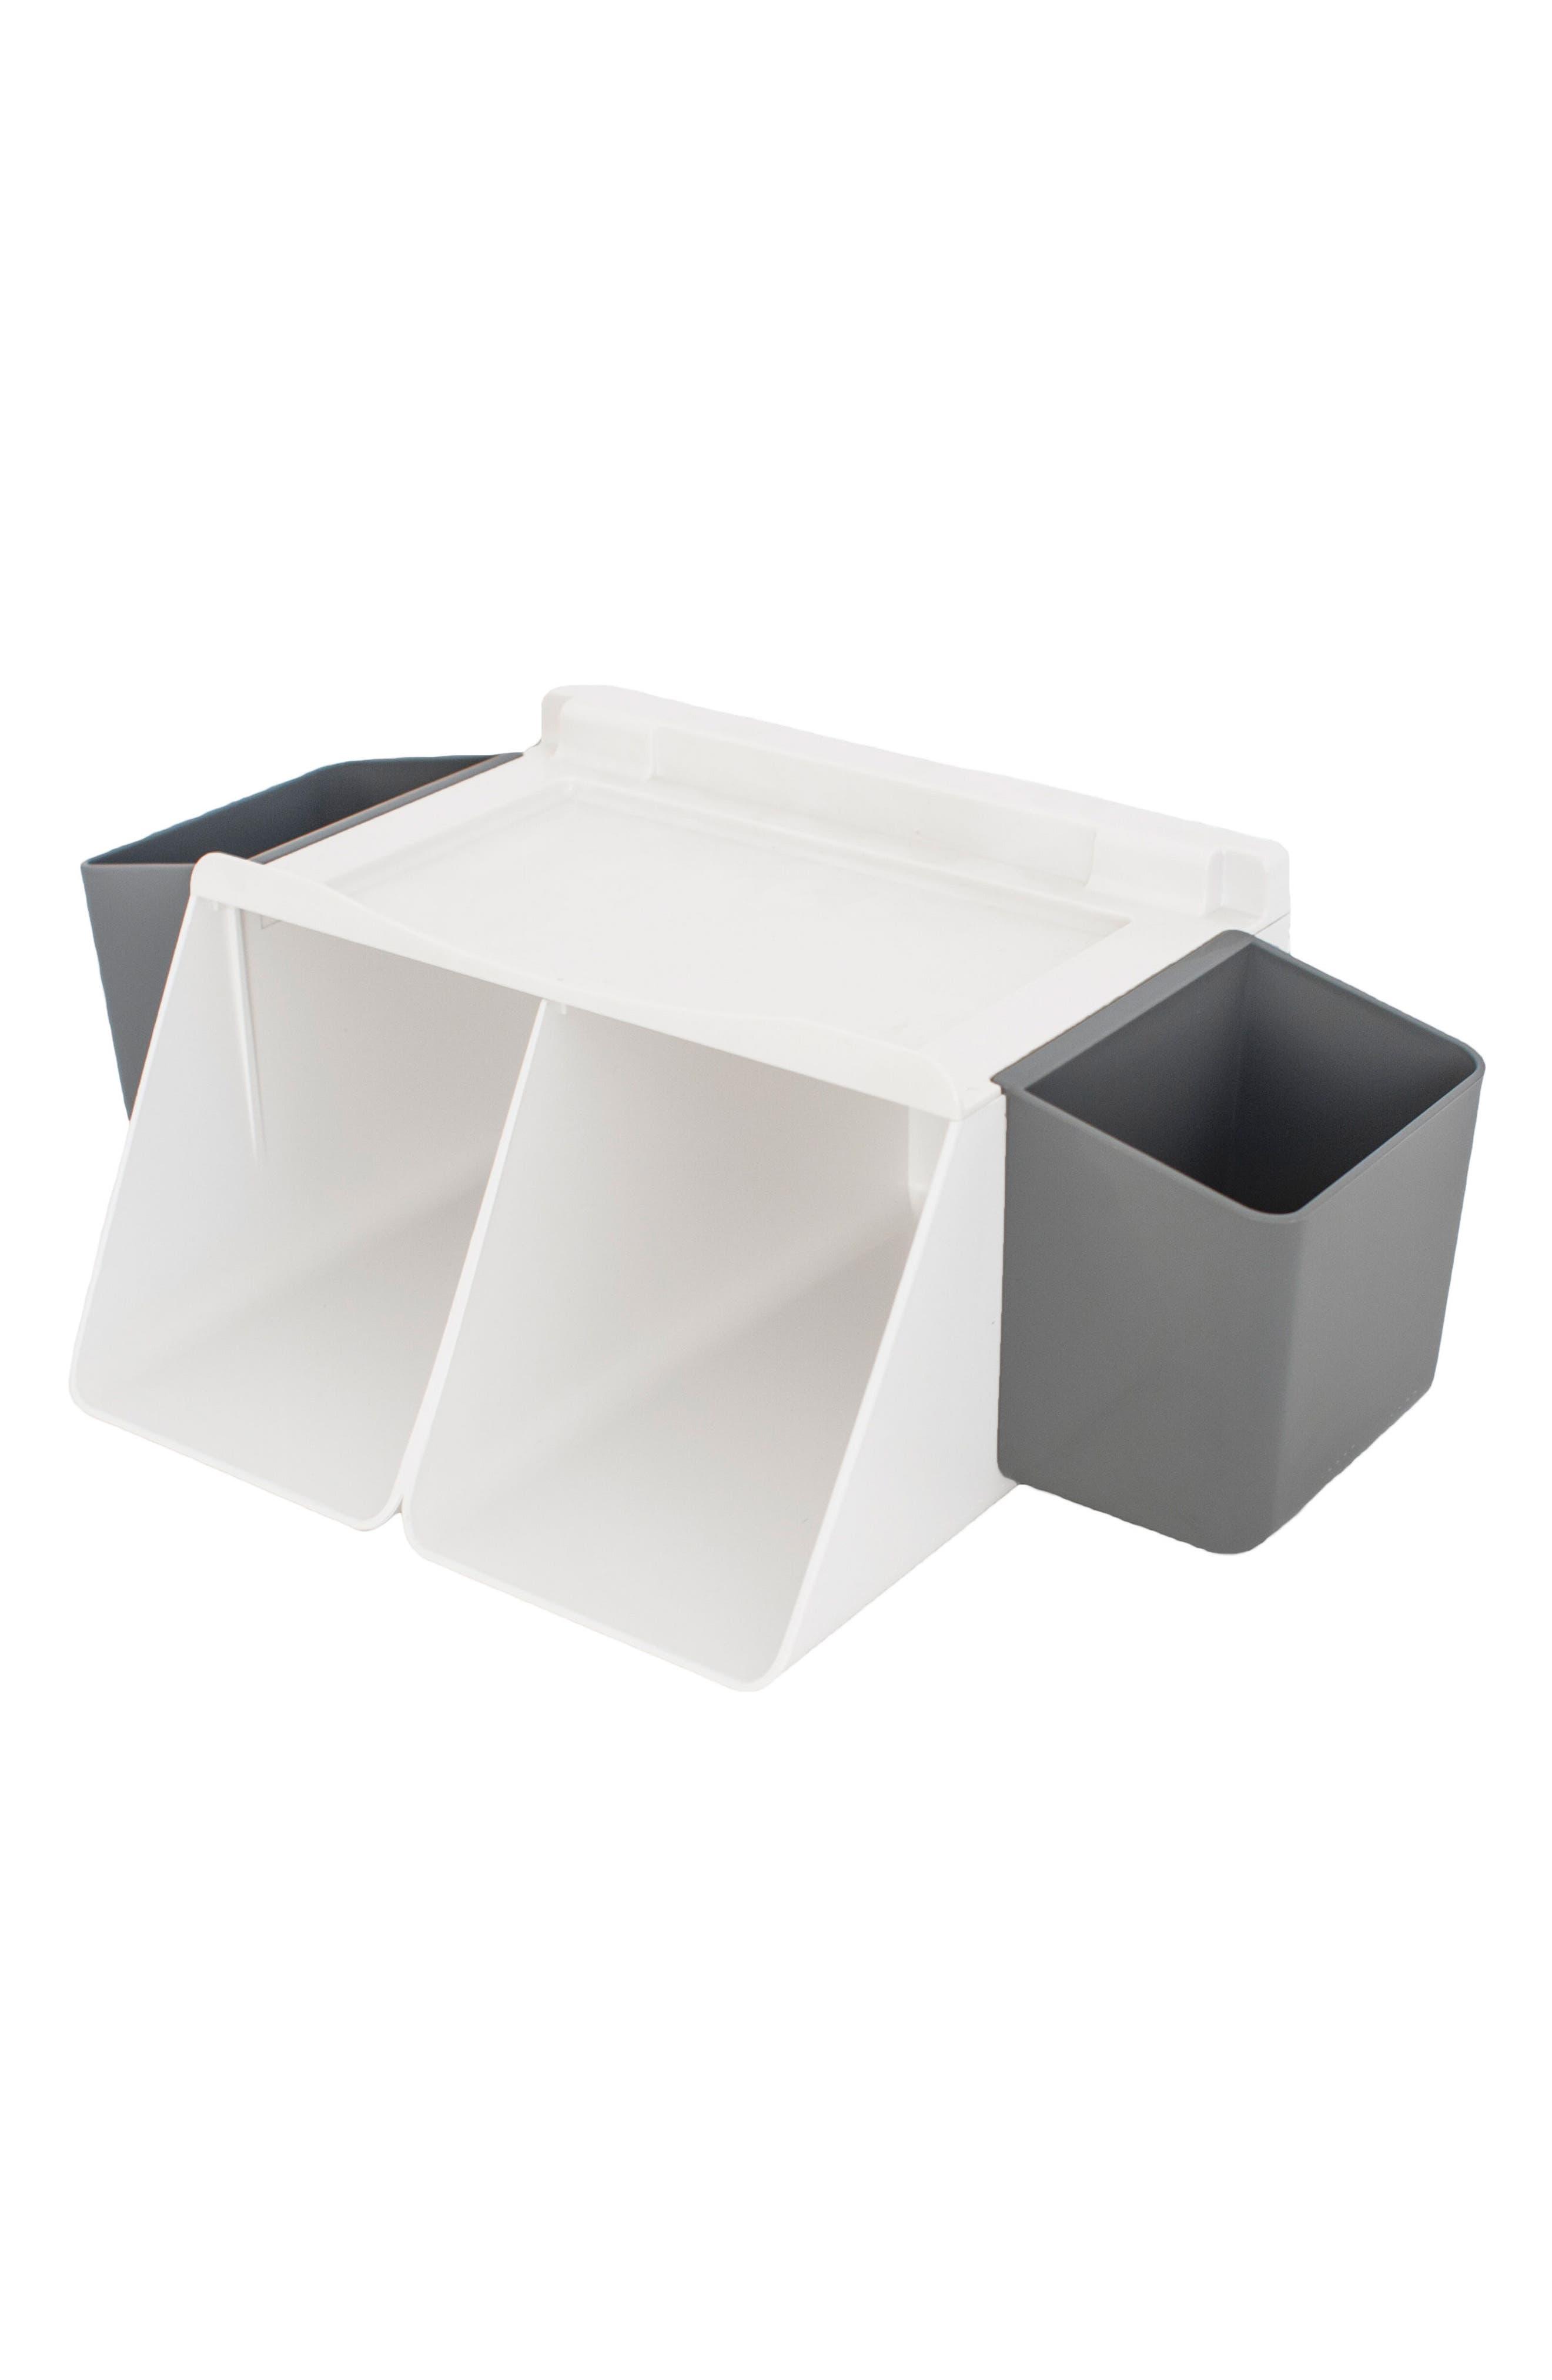 Prine Lionheart Dresser Top diaperDEPOT